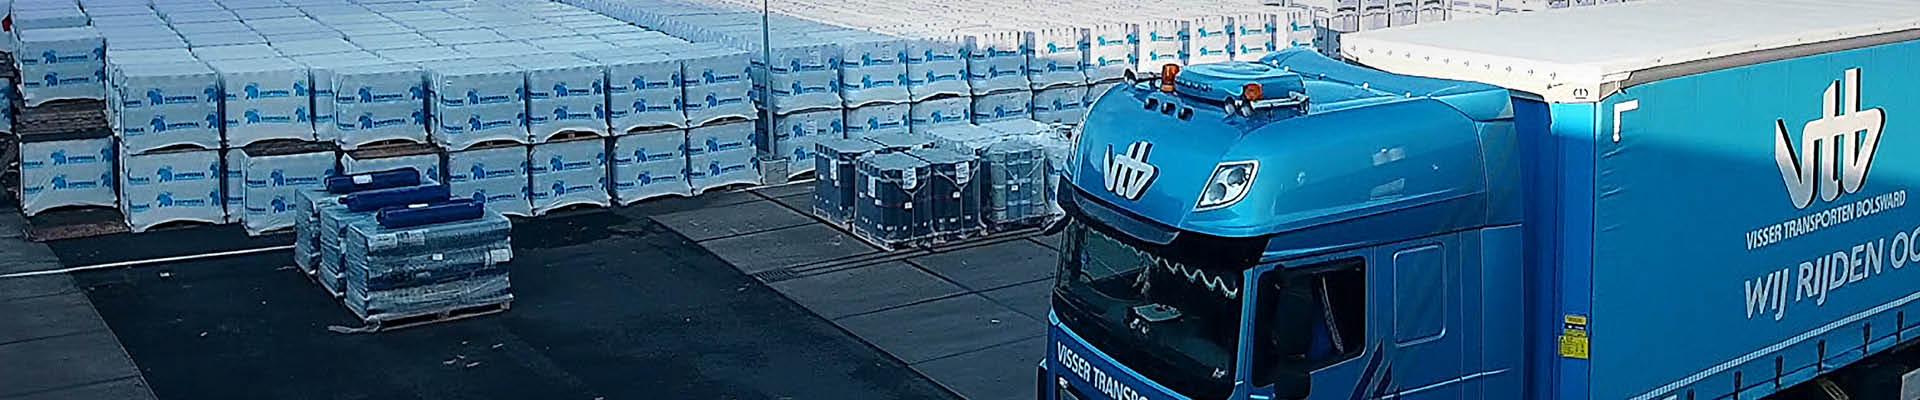 soprema vrachtwagen